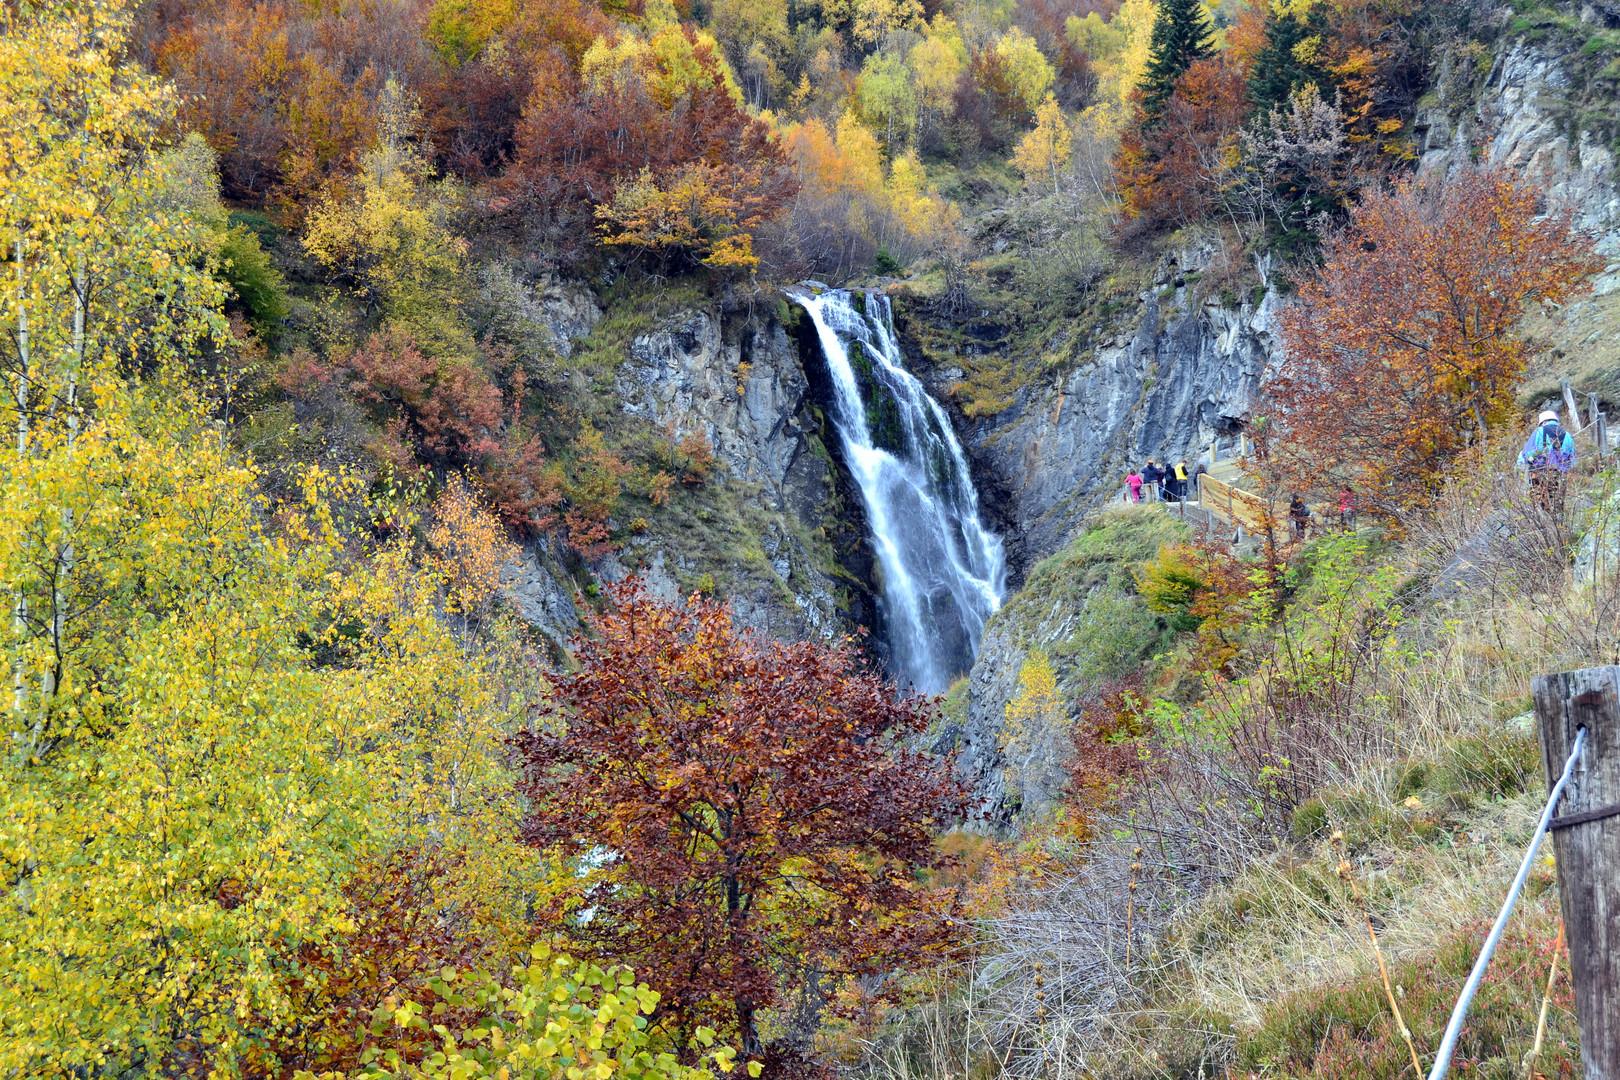 Salto de agua en otoño